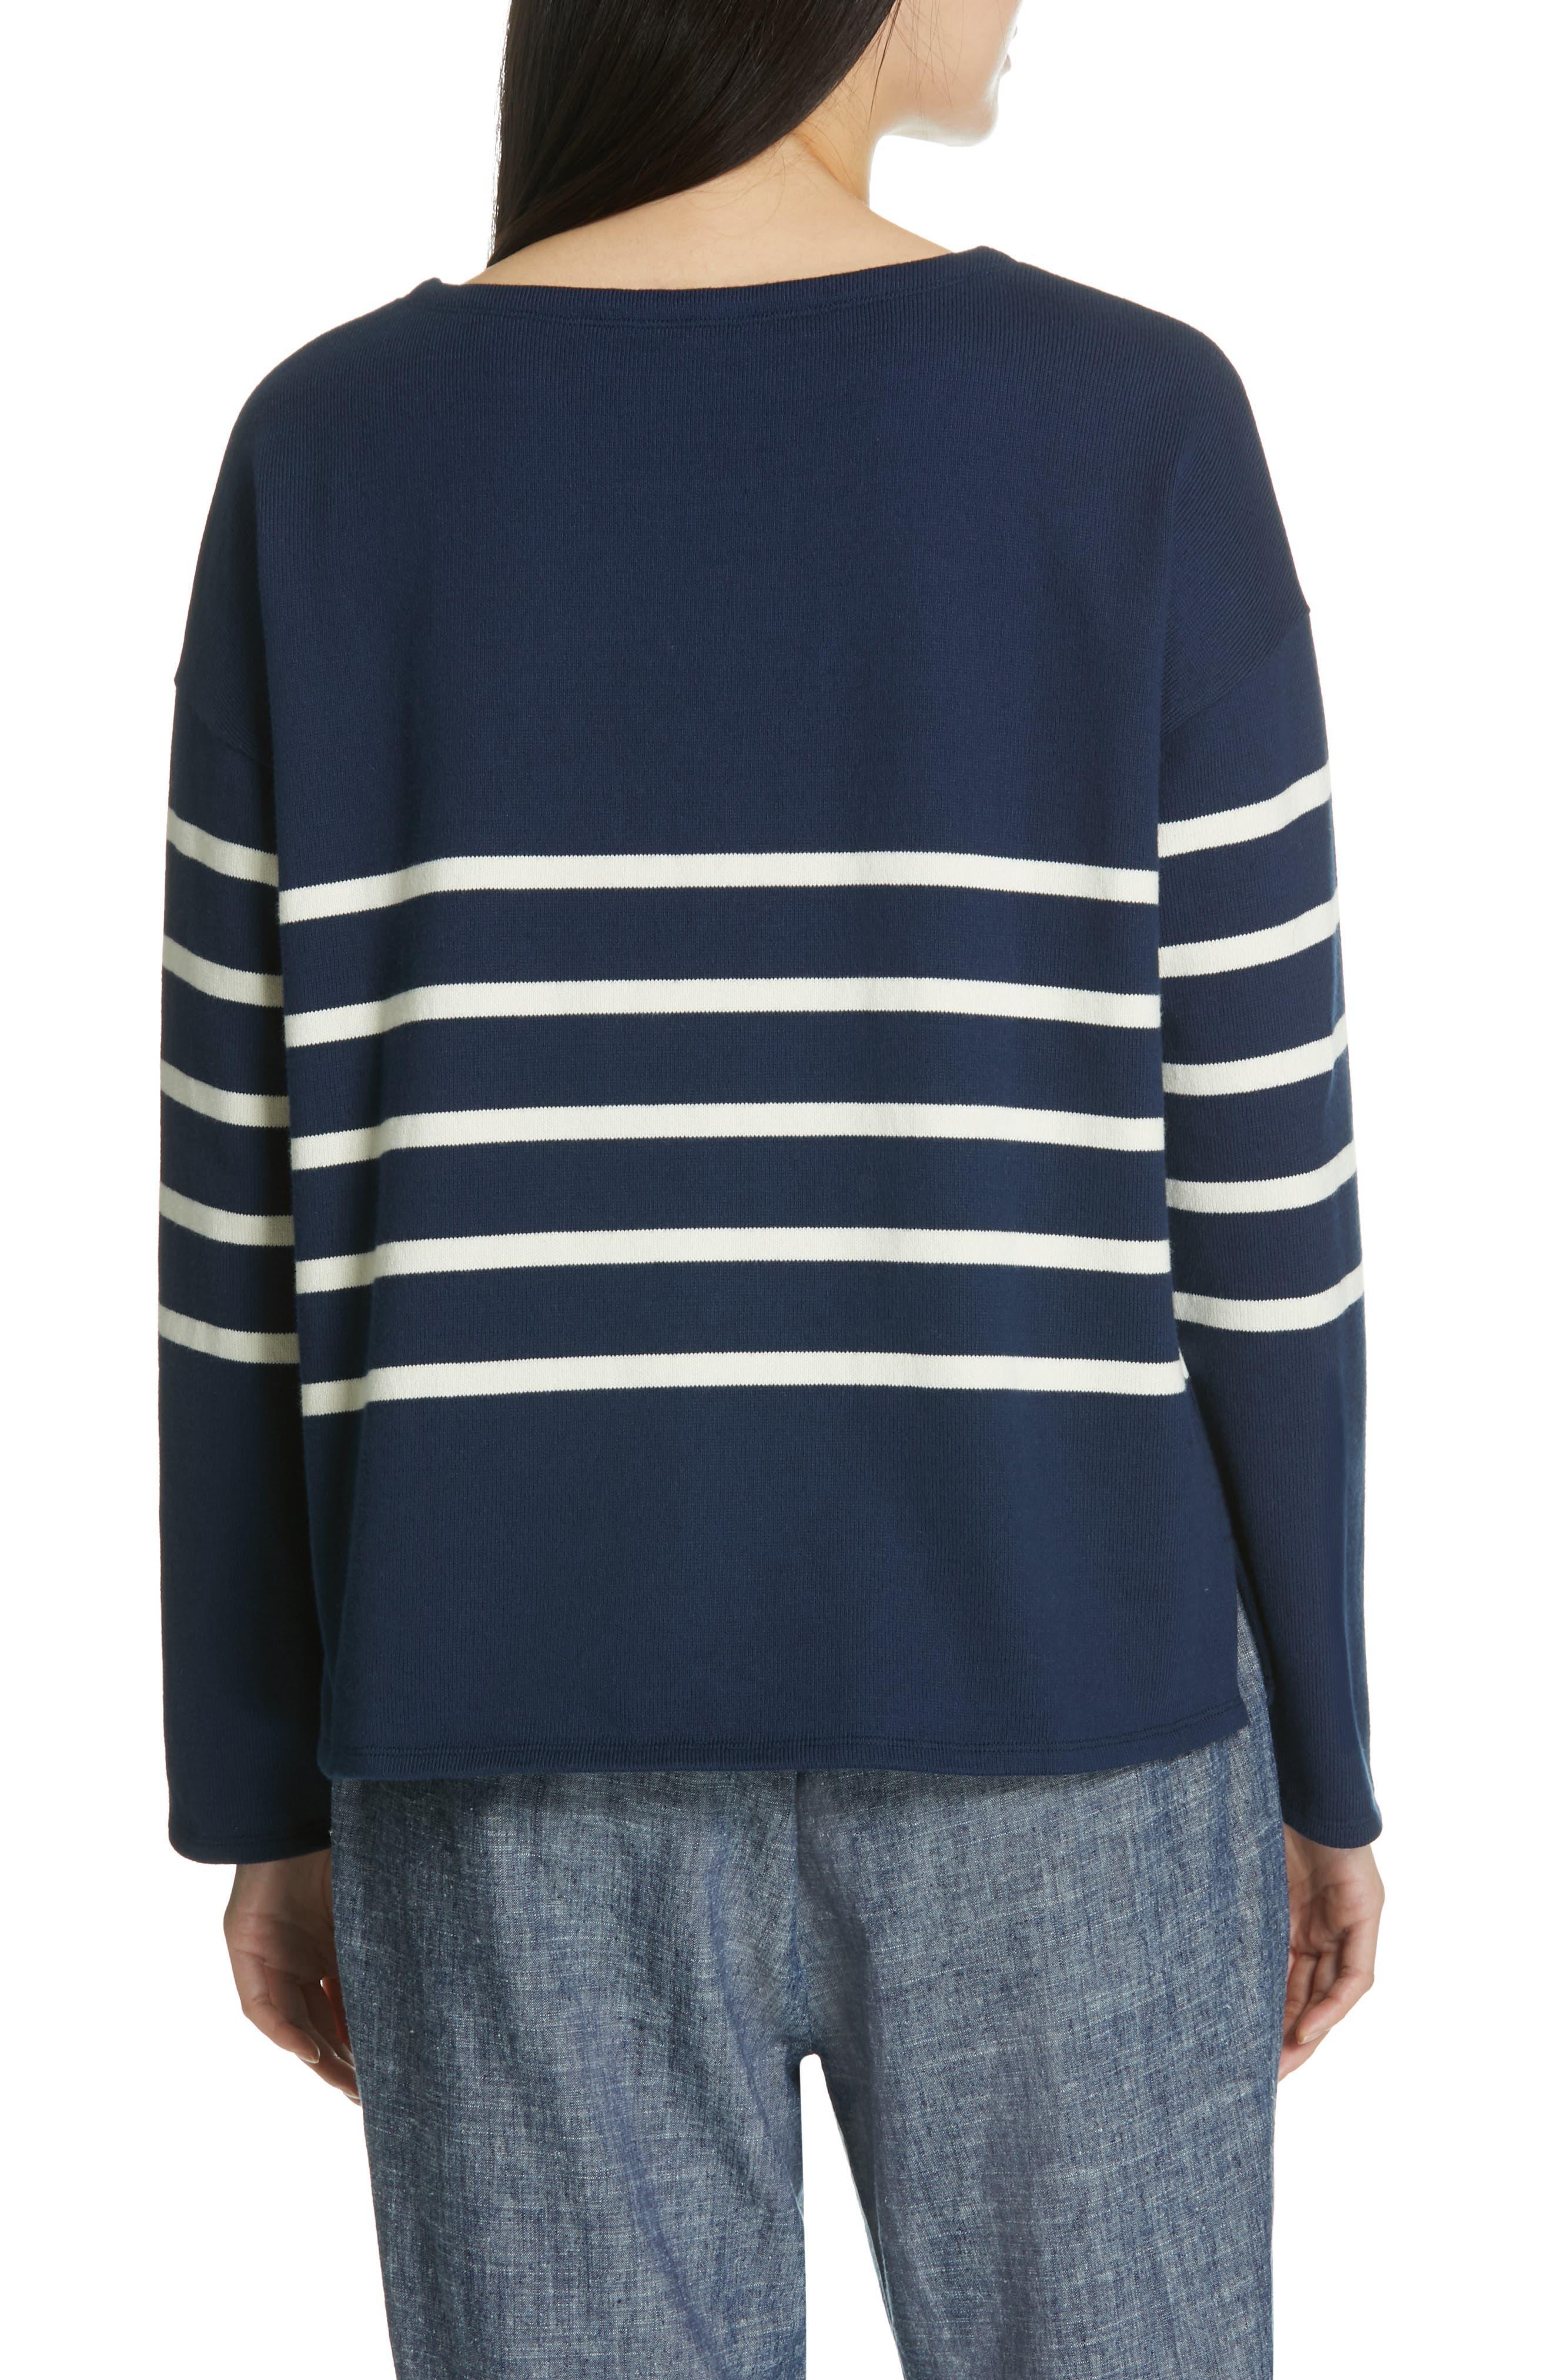 EILEEN FISHER, Stripe Organic Cotton Sweater, Alternate thumbnail 2, color, DENIM